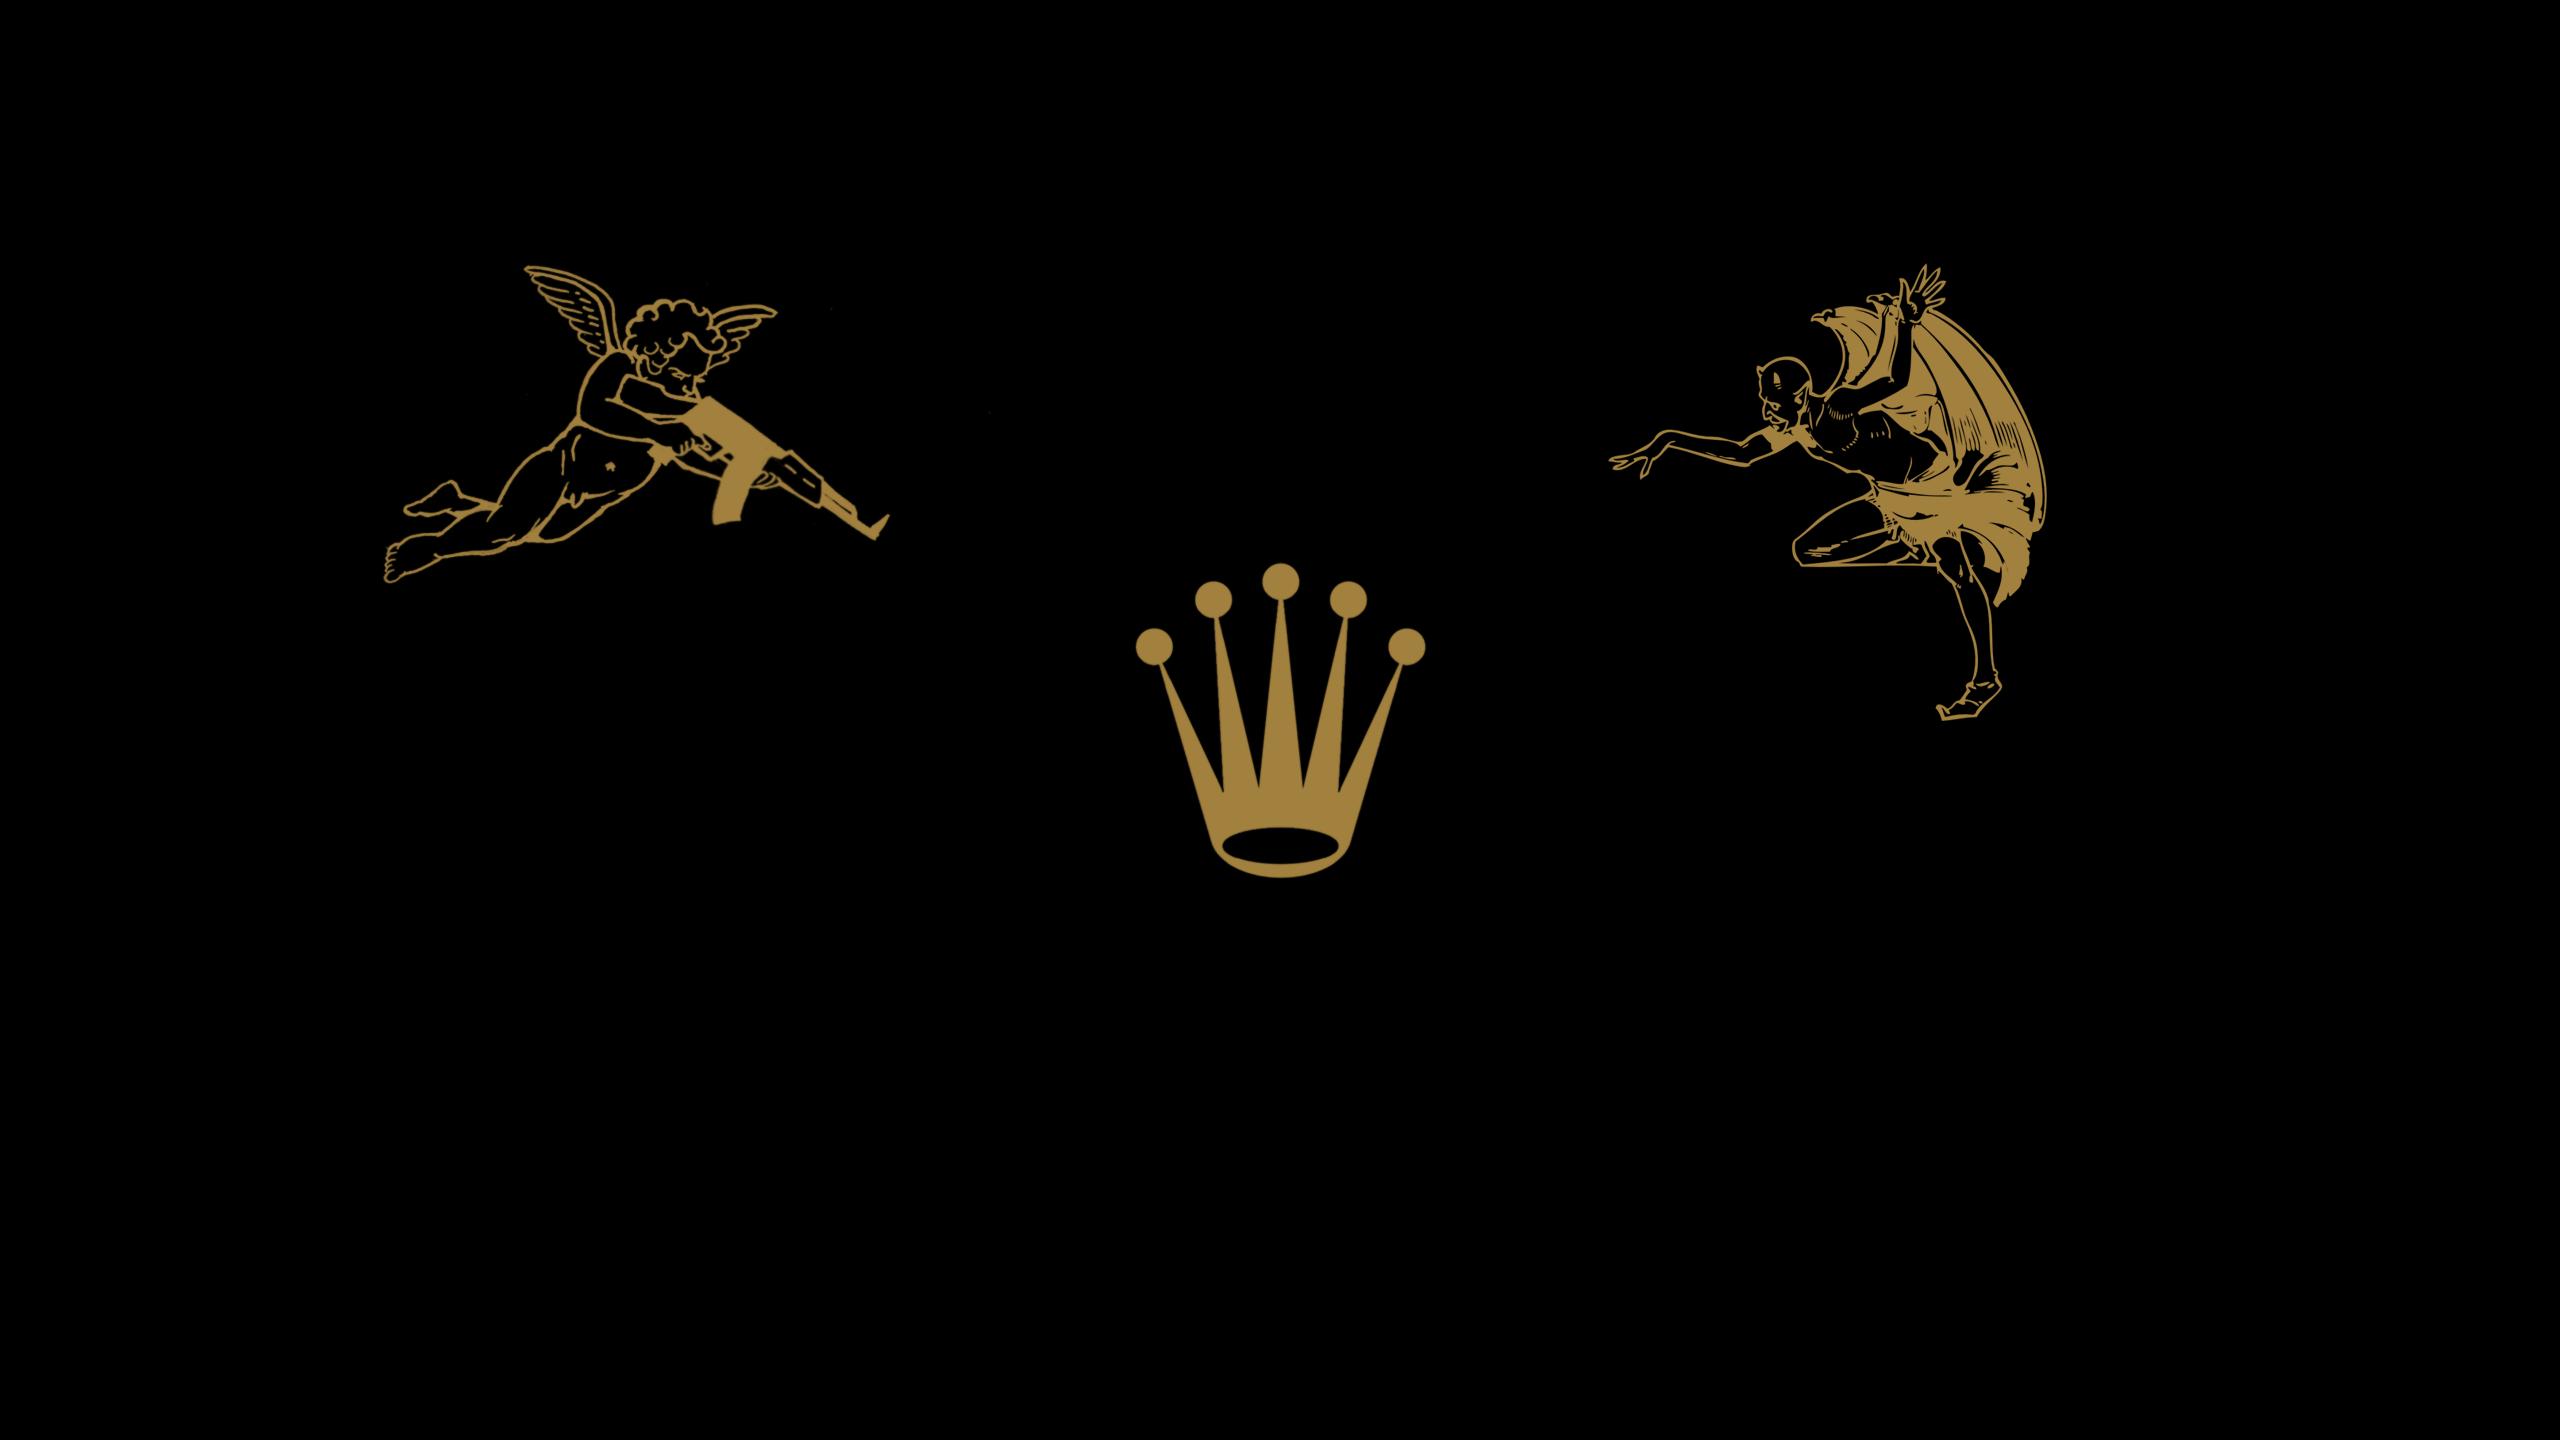 Amazing Rolex Wallpaper - drawing-illustration-black-background-logo-AK-47-Rolex-devils-font-24289 Pictures_712822.png